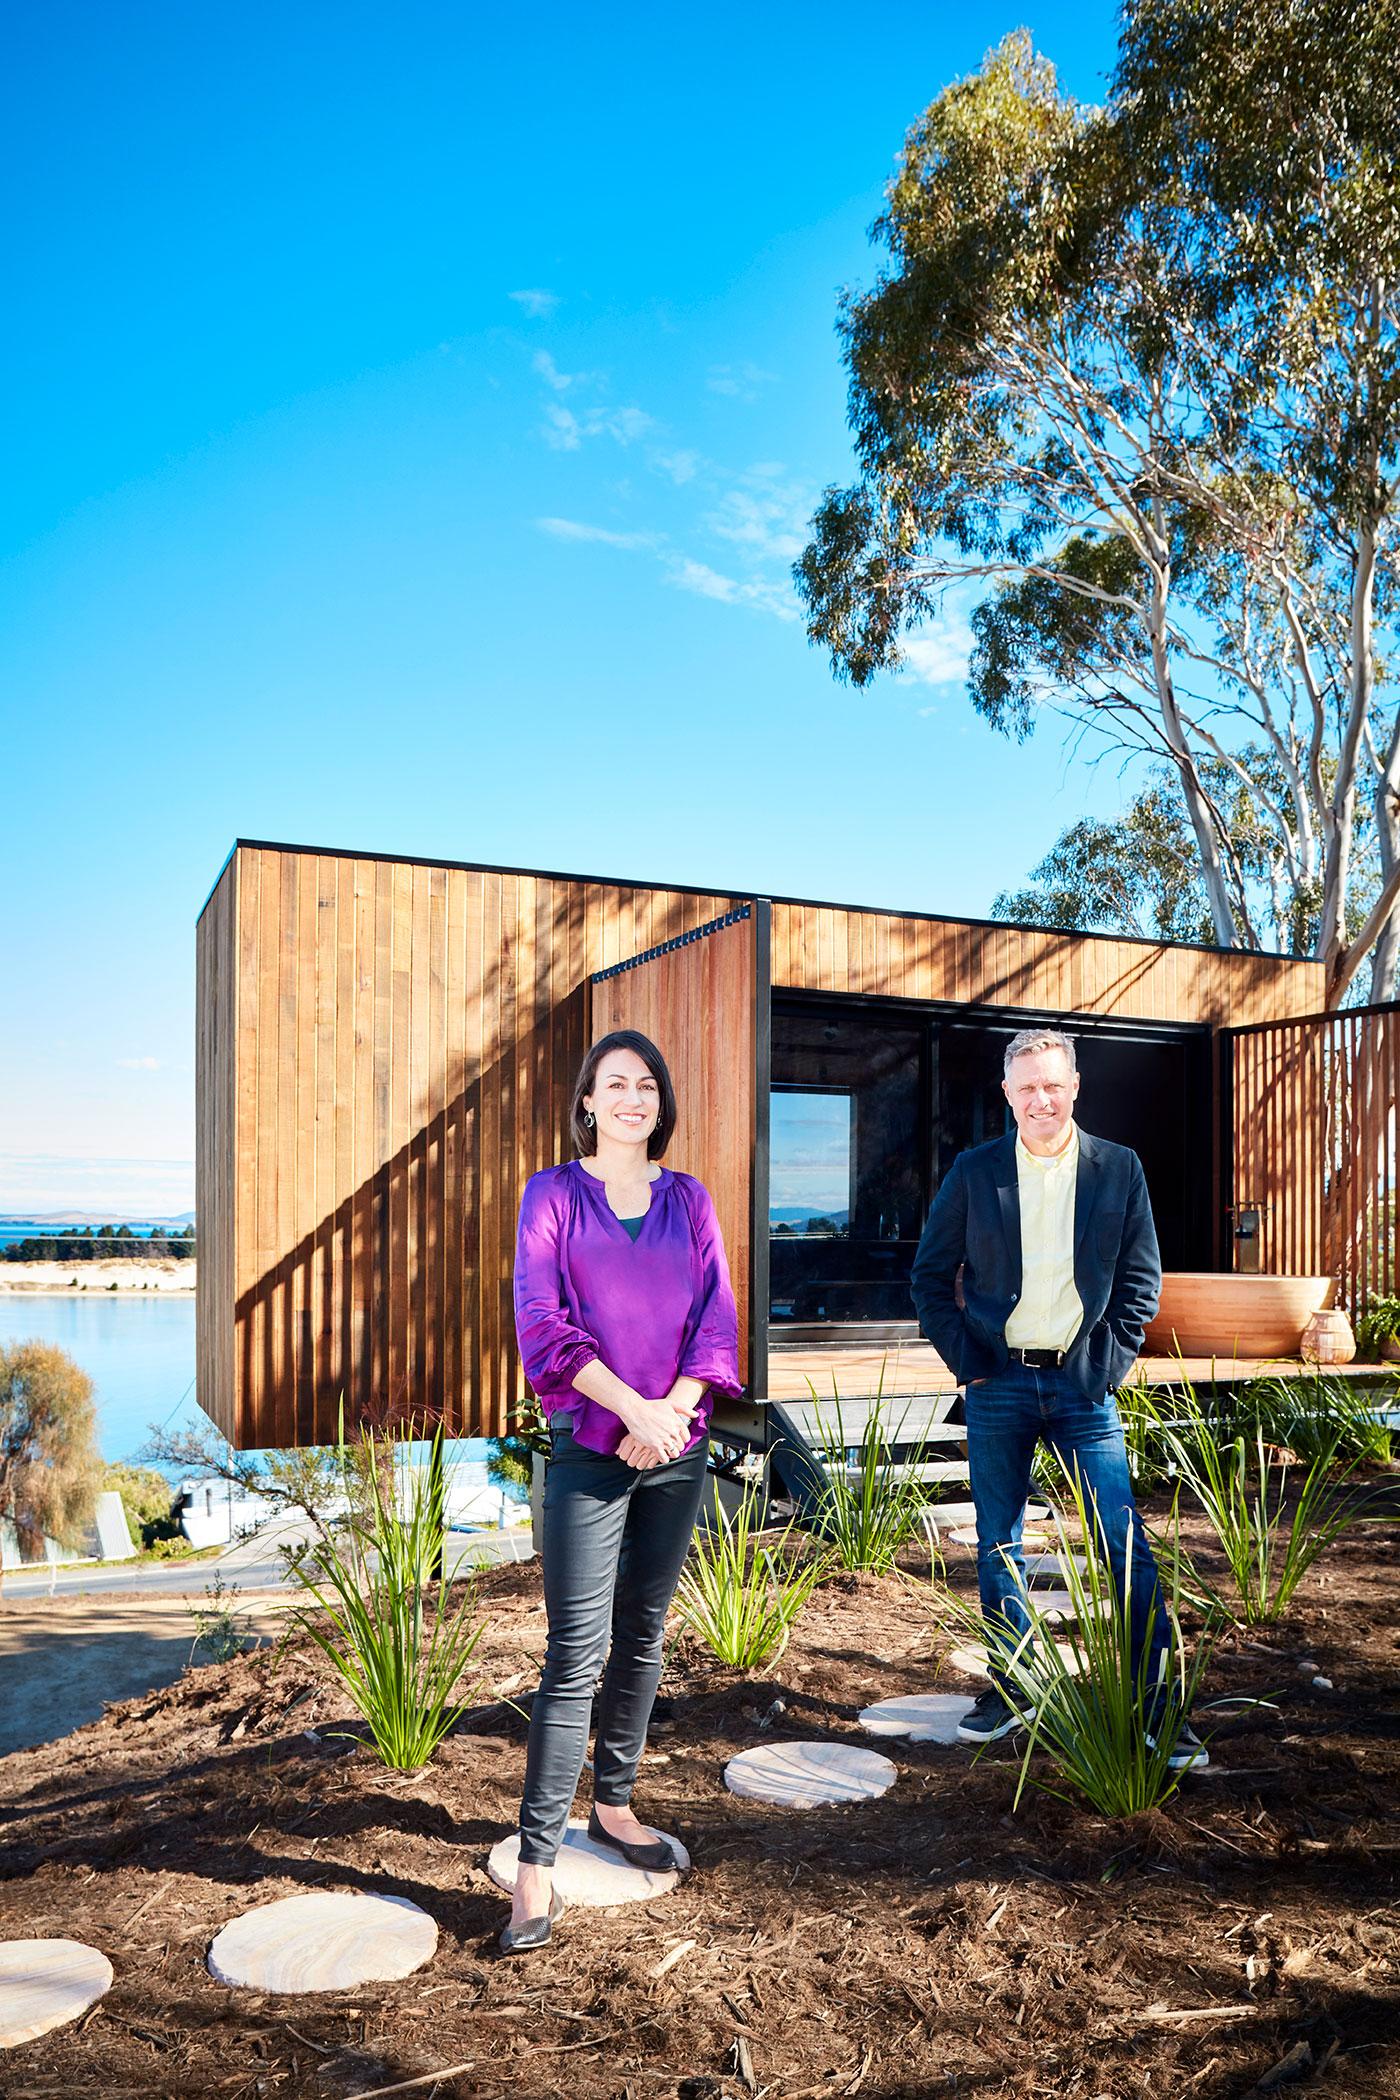 GRAND DESIGNS AUSTRALIA SERIES 8 HOST & HOME OWNER PORTRAITS 3